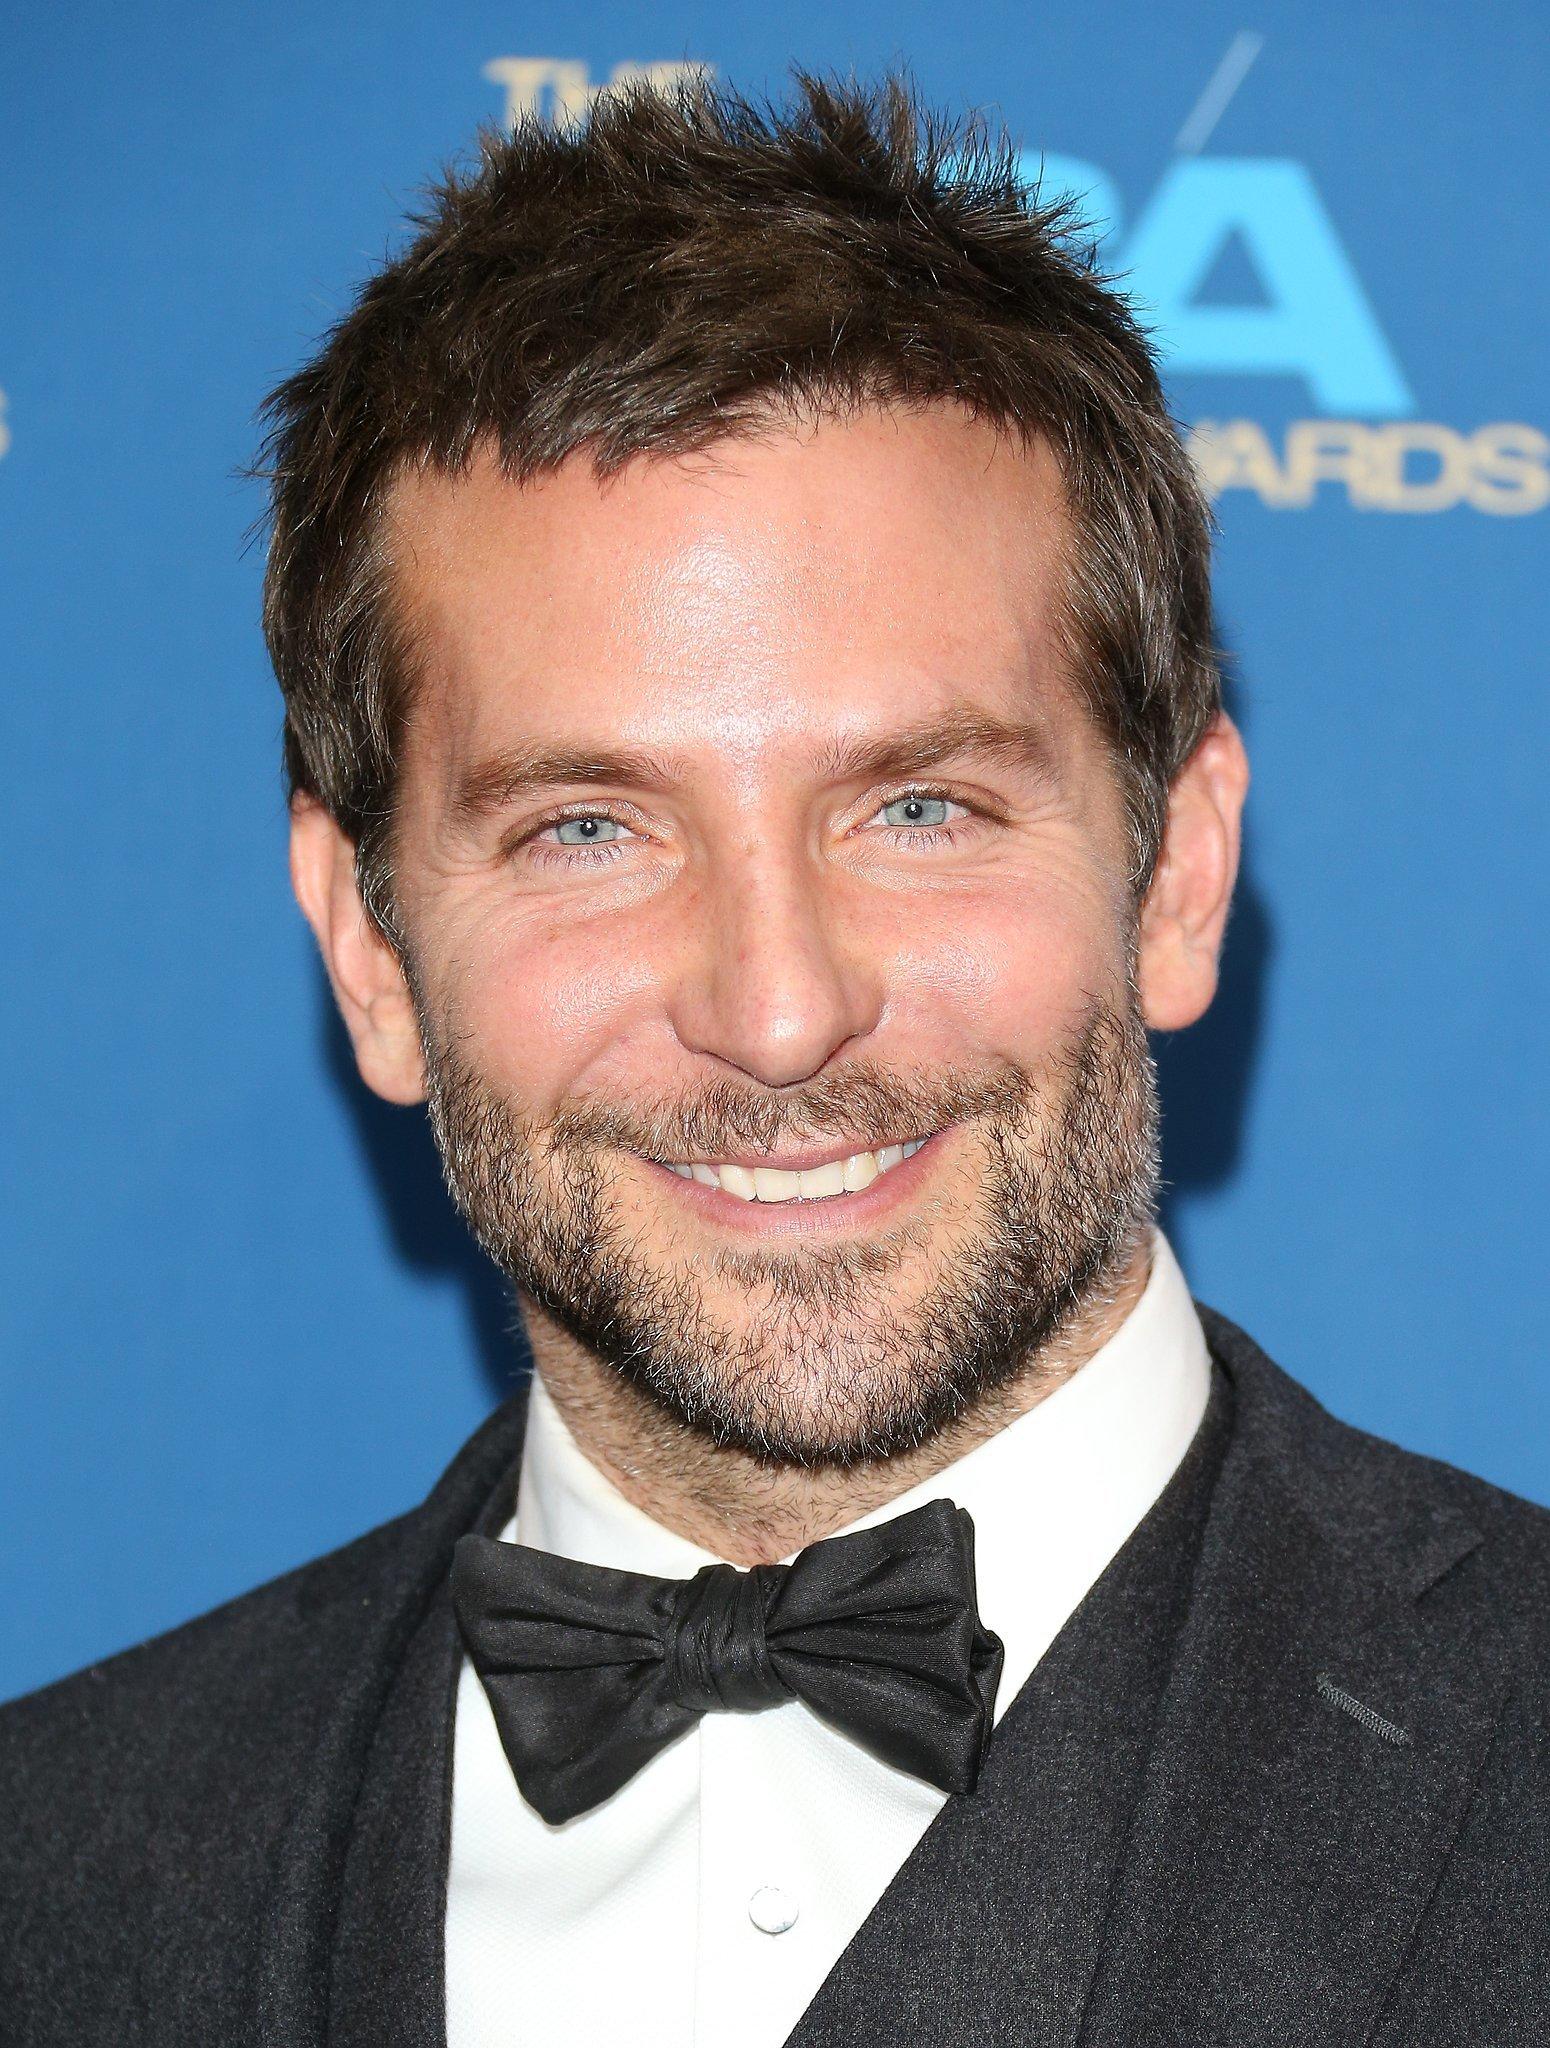 Bradley Cooper attended the Directors Guild Awards.